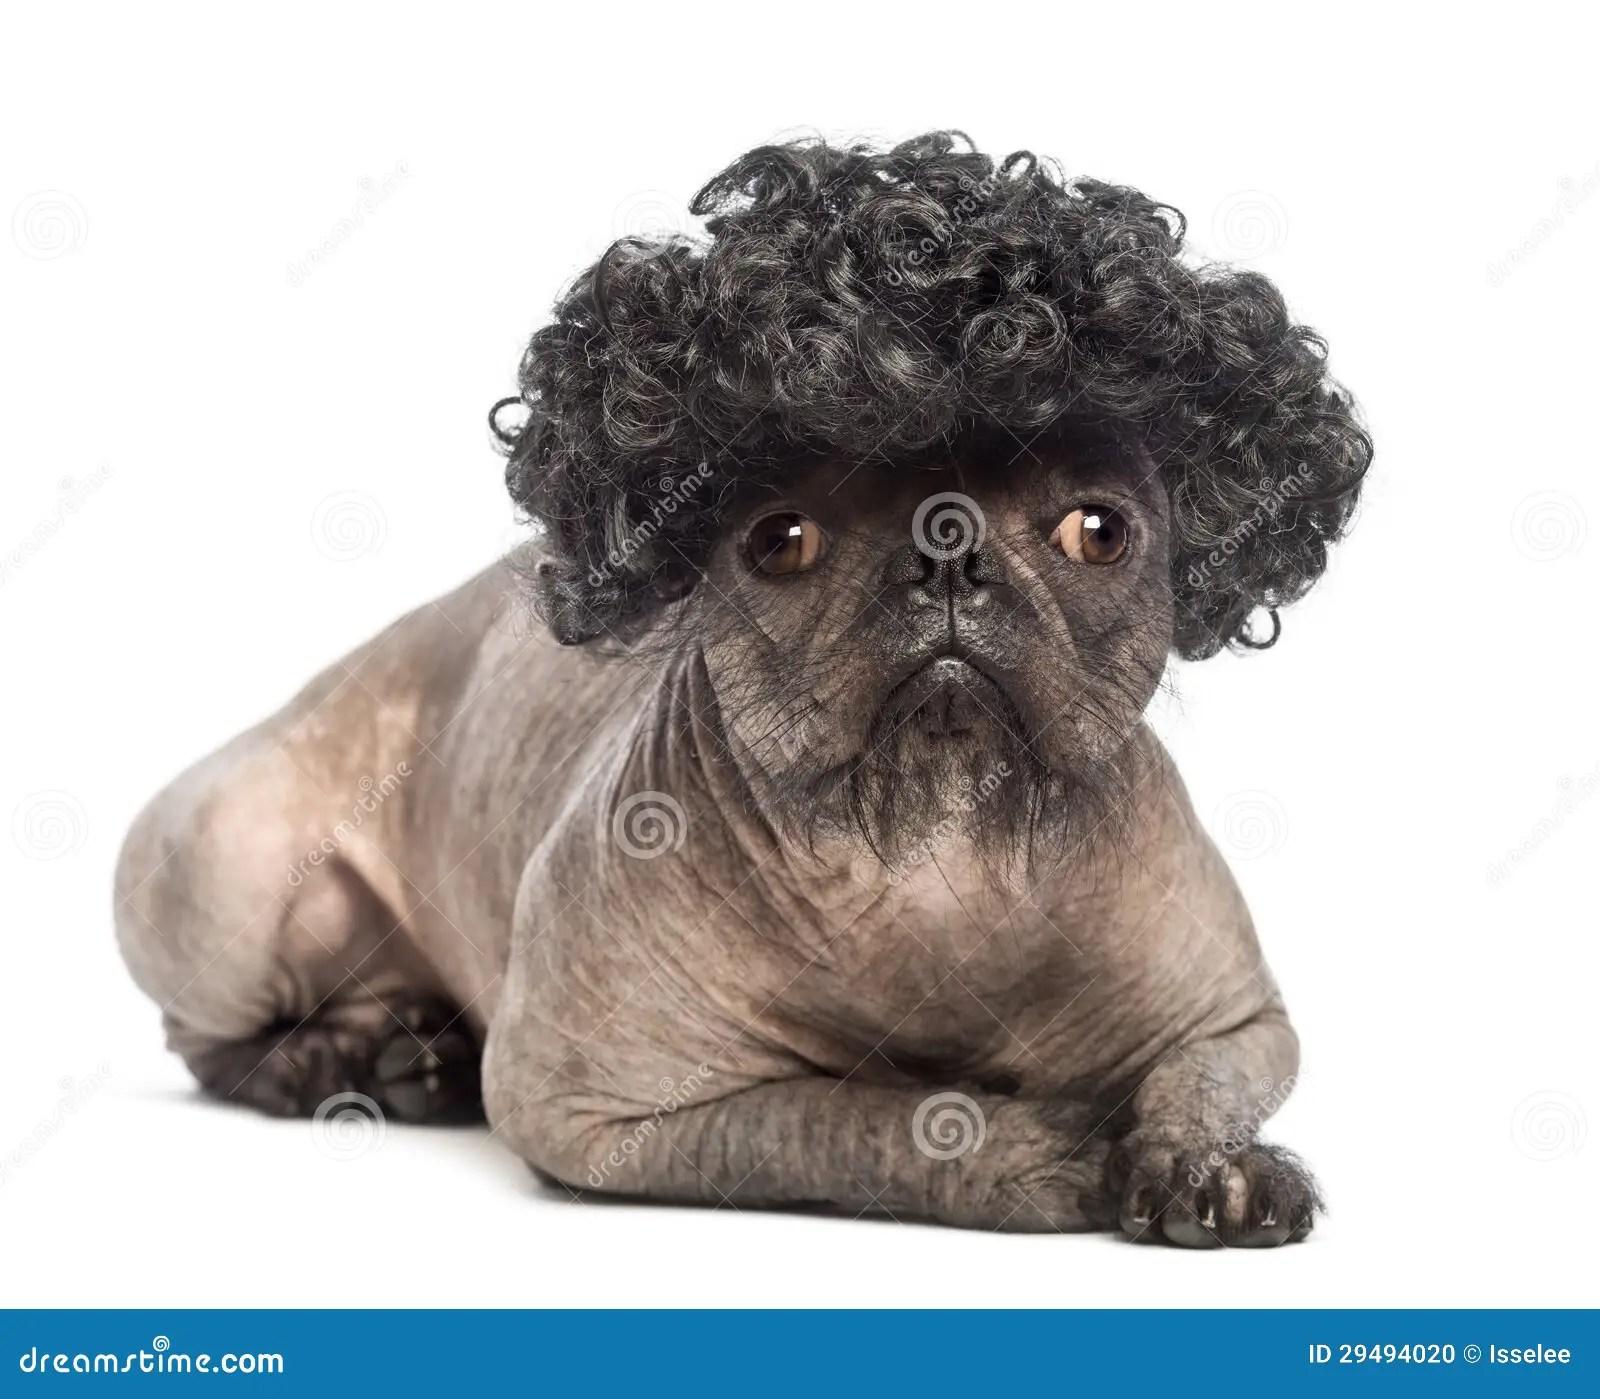 Hairless Mixed Breed Dog Mix Between A French Bulldog And